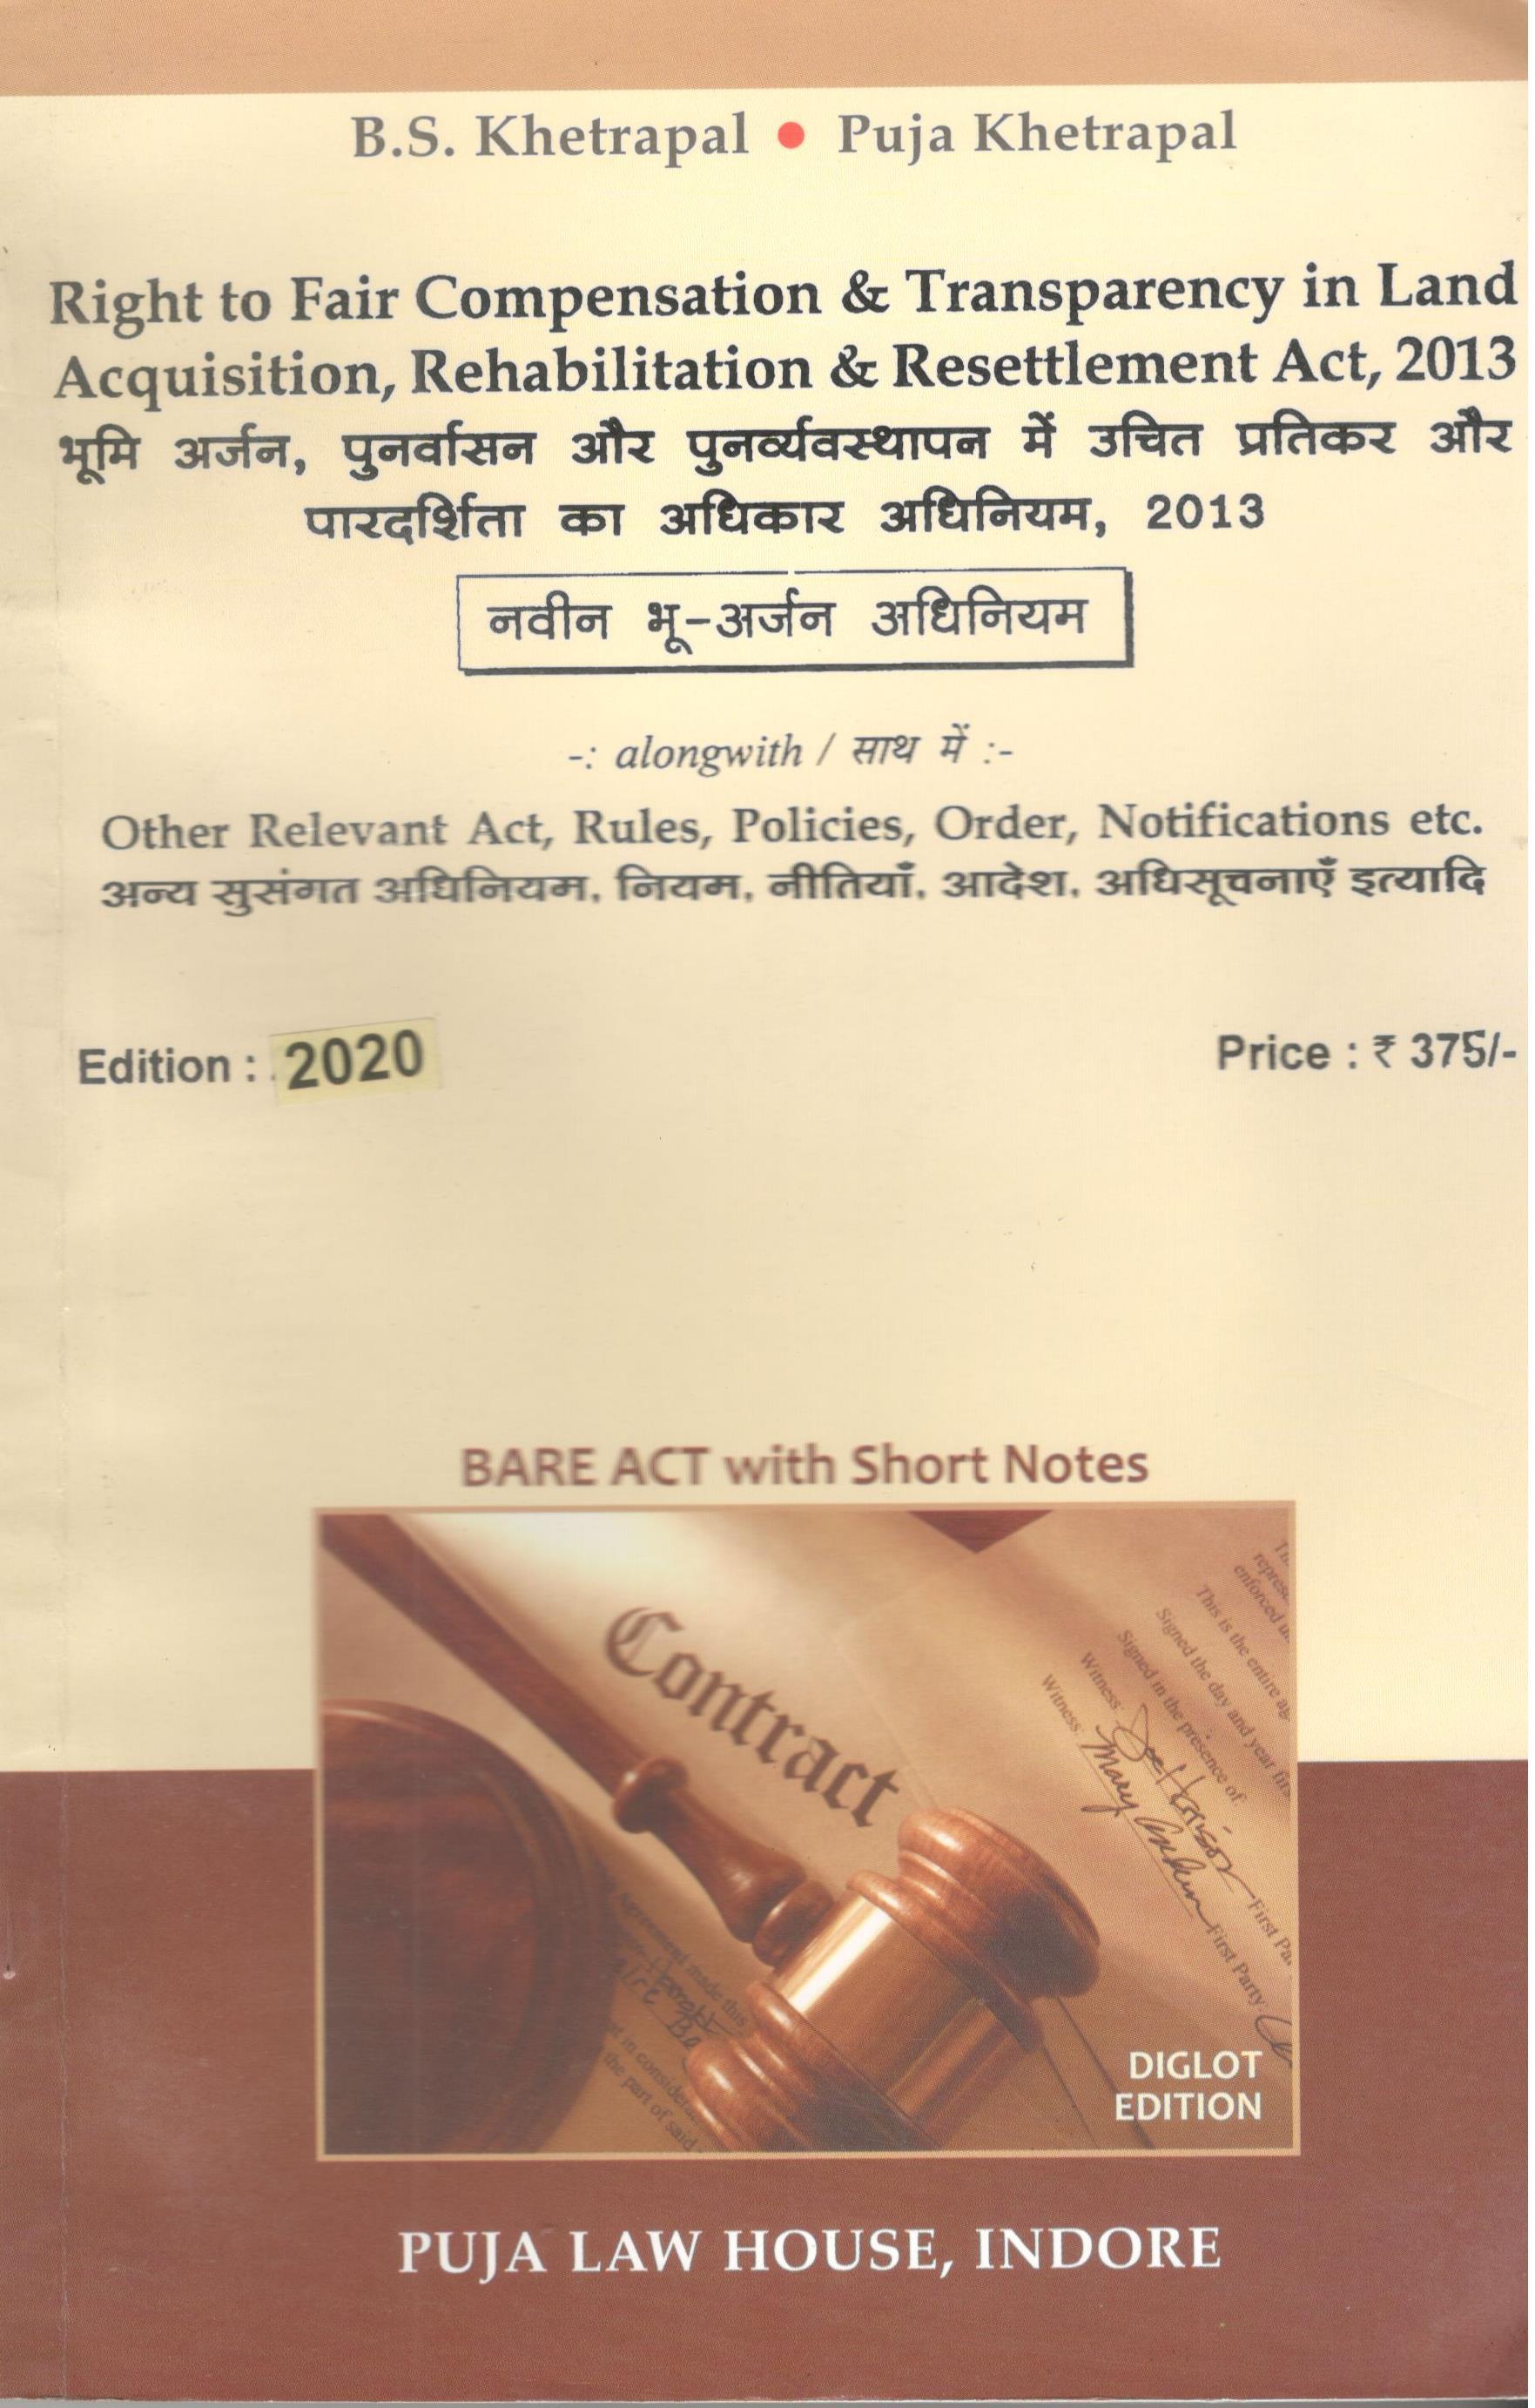 भूमि अर्जन, पुनर्वासन और पुनर्व्यस्थापन में उचित प्रतिकर और पारदर्शिता का अधिकार अधिनियम, 2013 / The Right to Fair Compensation and Transparency in Land Acquisition, Rehabilitation and Resettlement Act, 2013